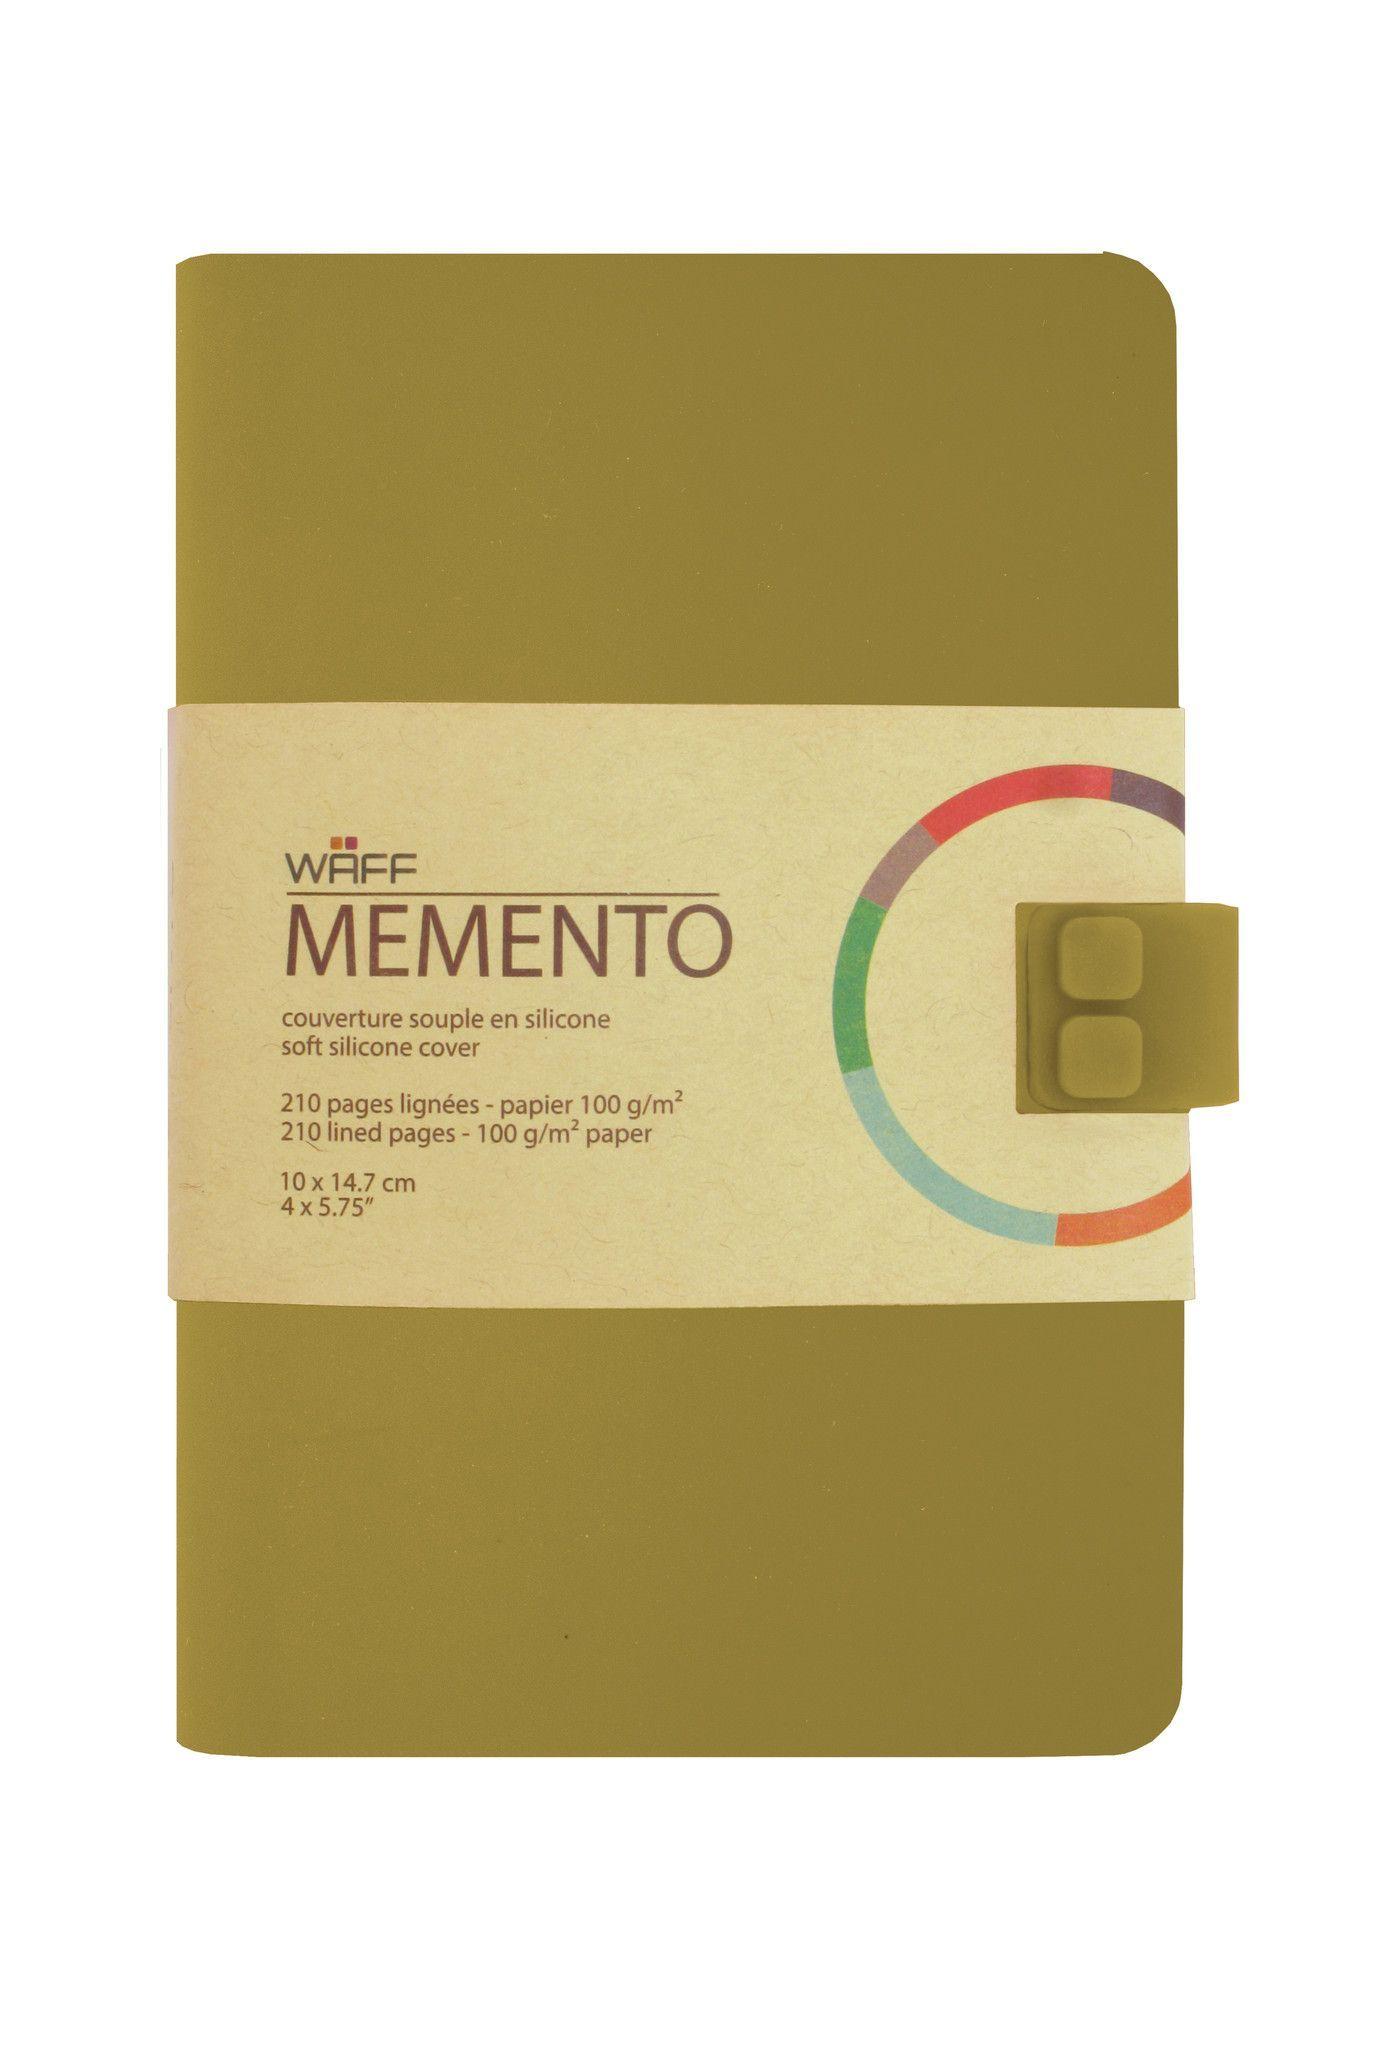 WAFF Memento Notebook - Olive / Medium